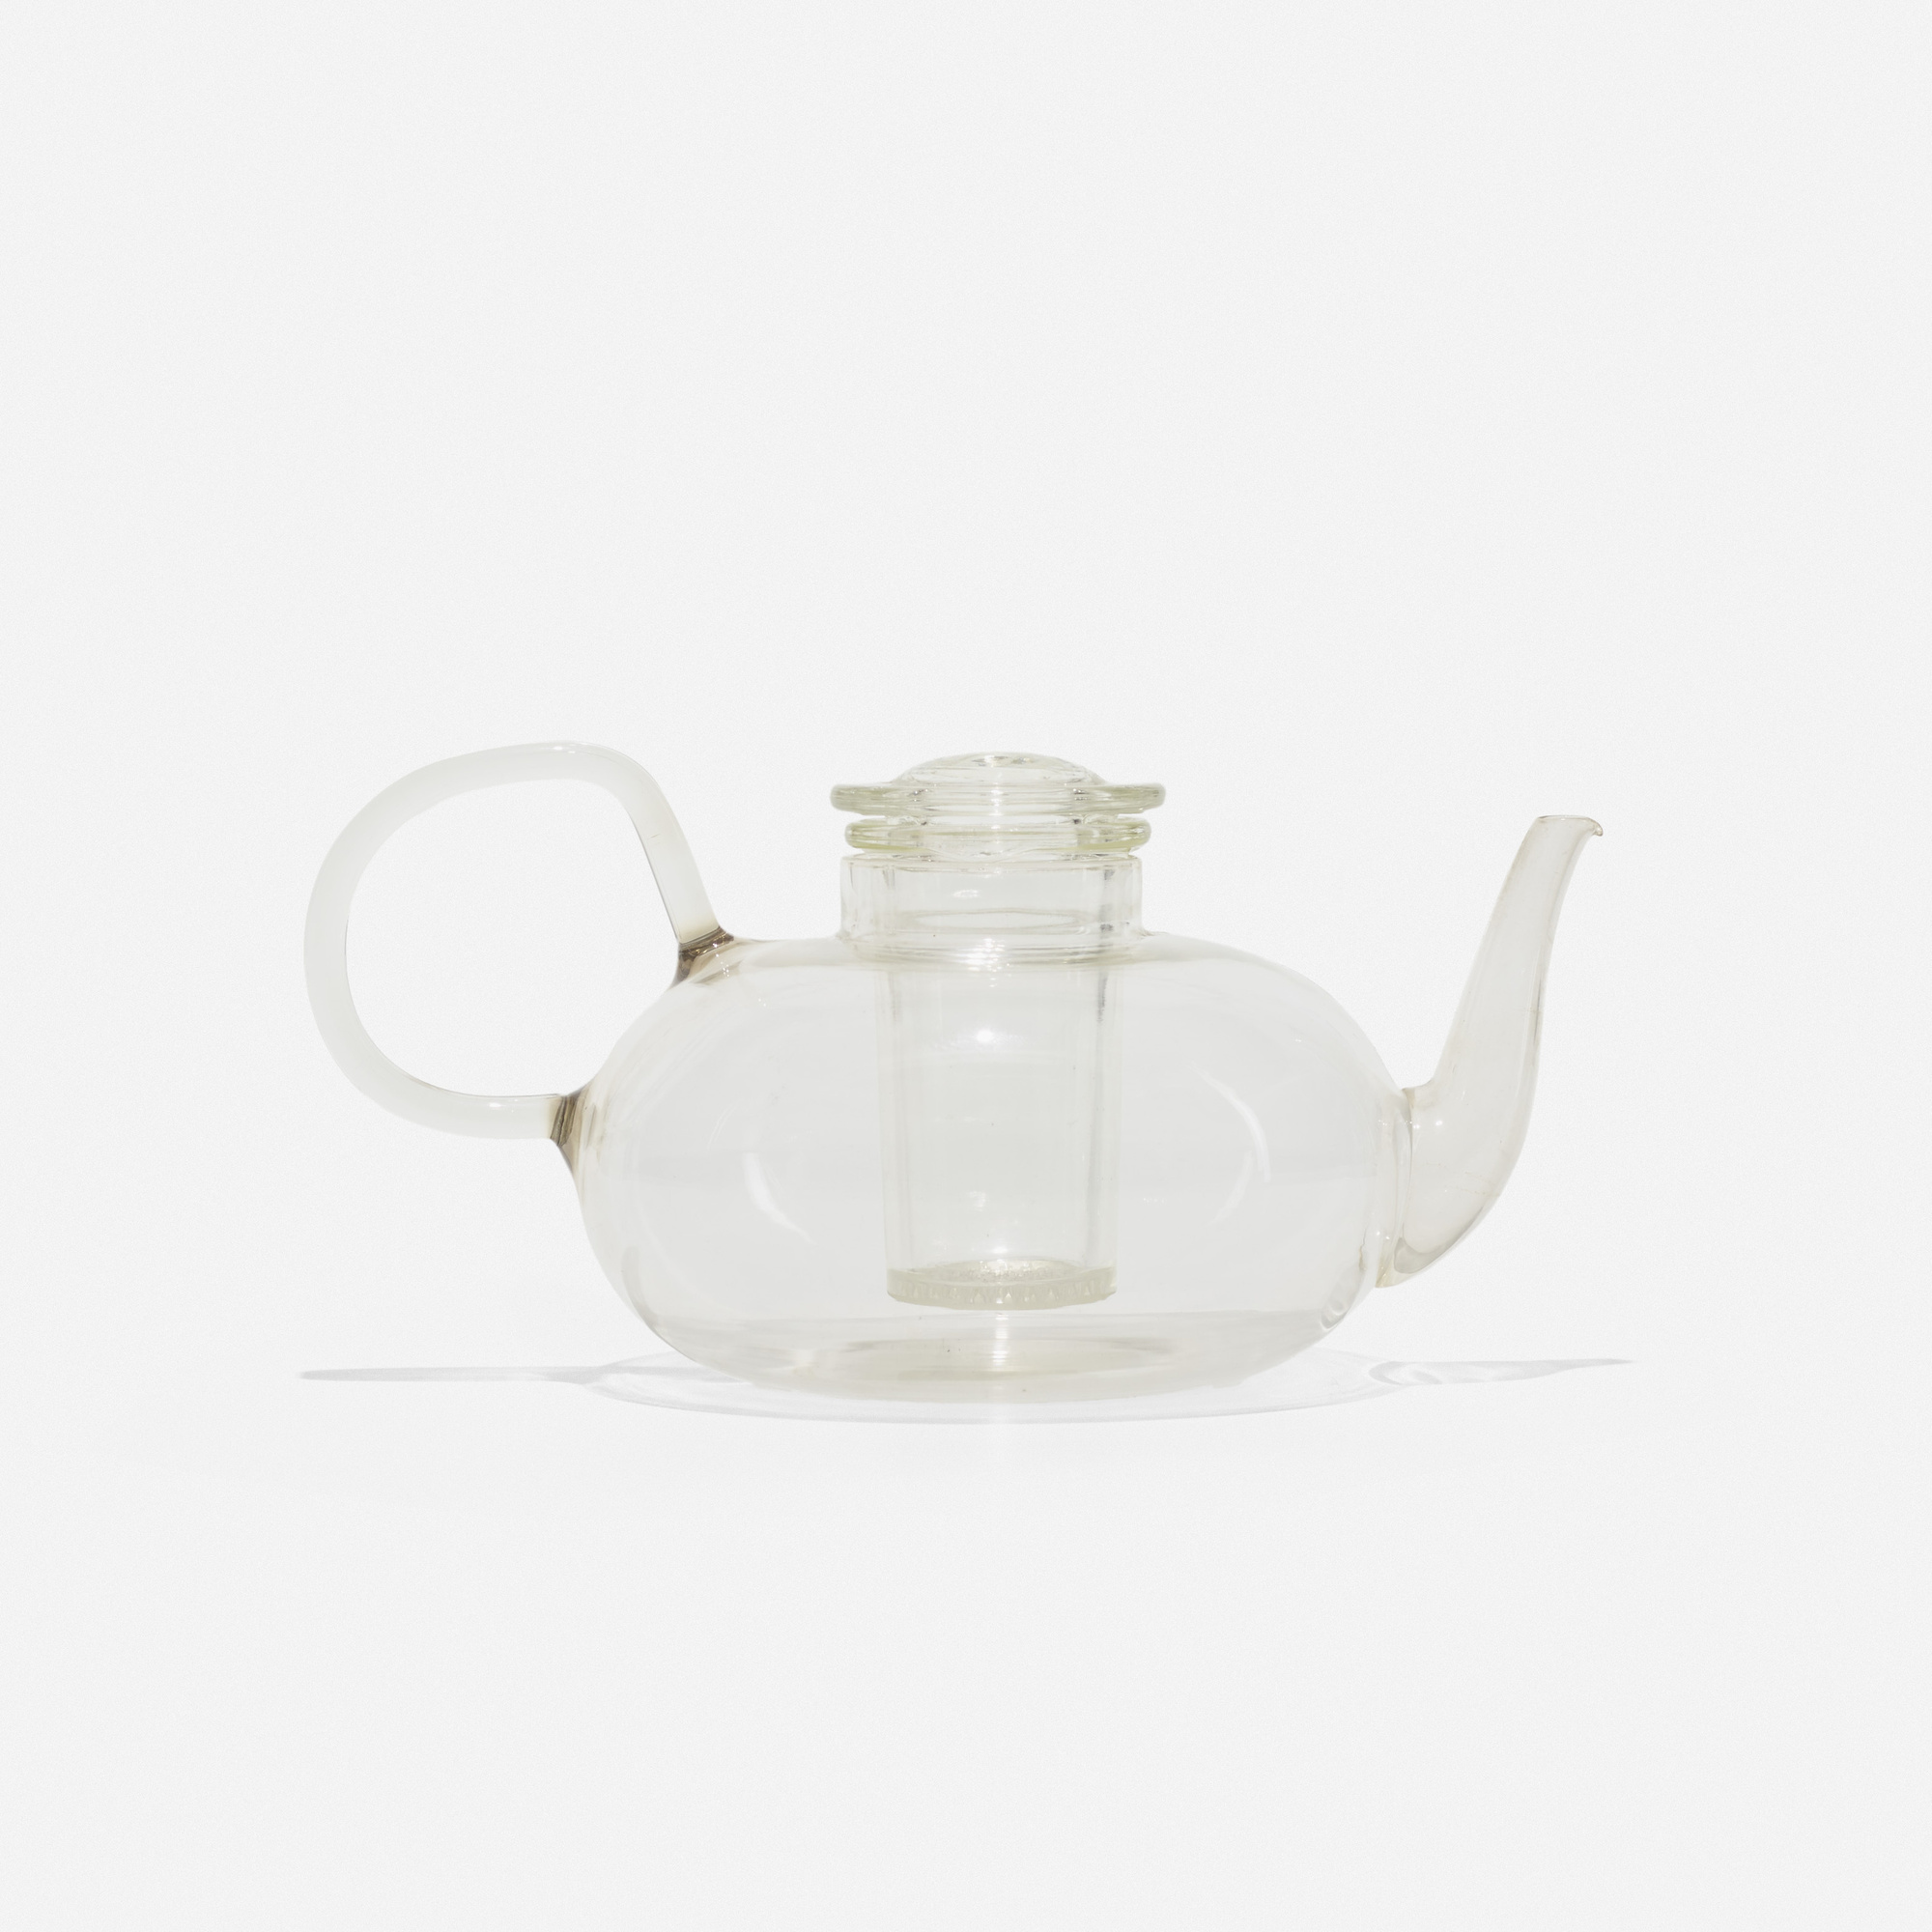 391: Wilhelm Wagenfeld / teapot (1 of 3)